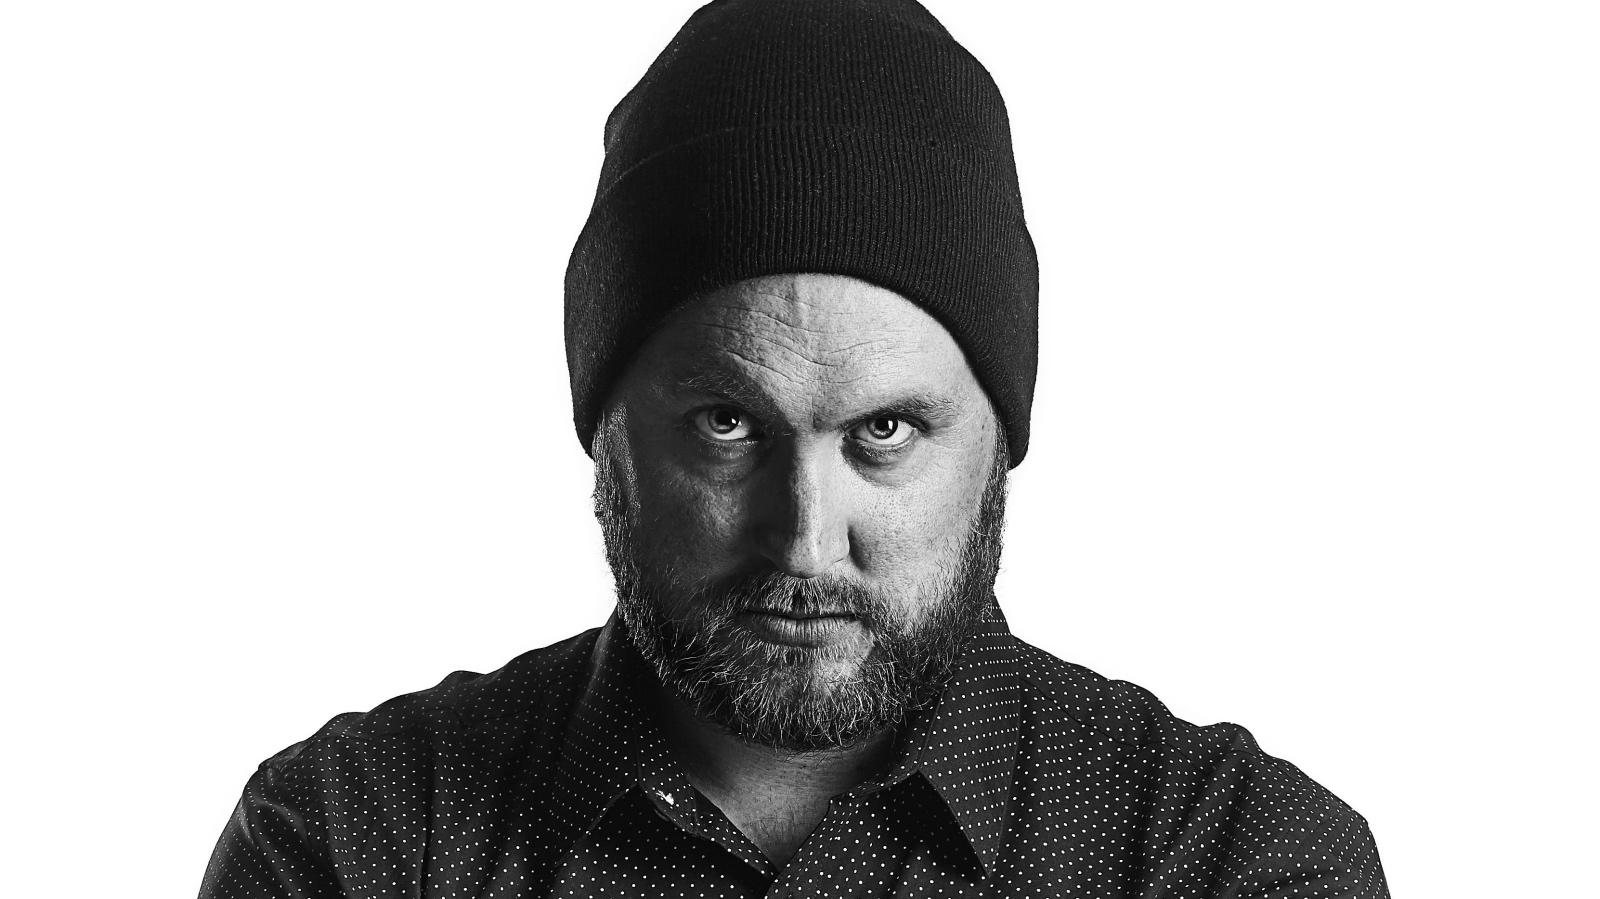 Henrik Belden, Black & White 2016 — by Marco Sieber [Fotografie]